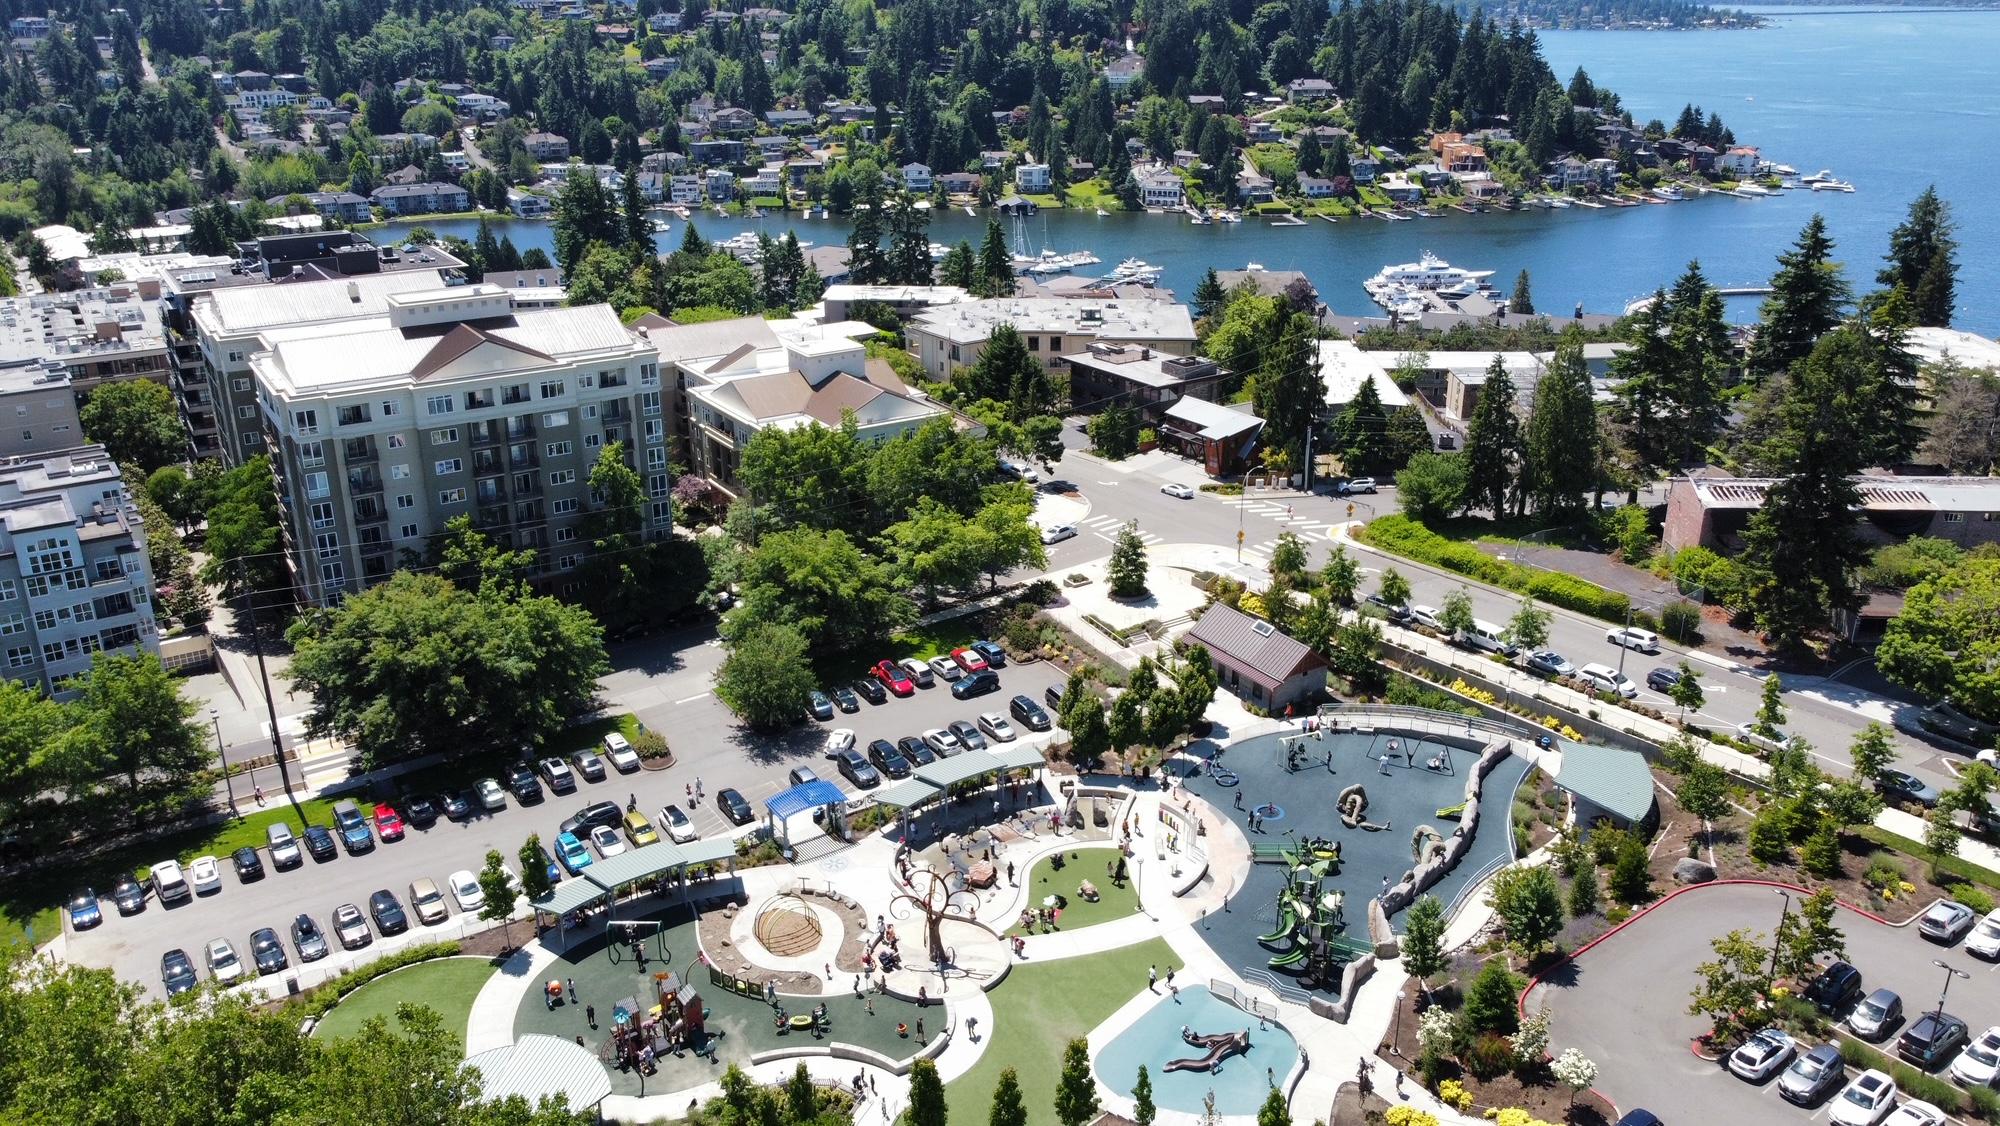 Bellevue Downtown Park Playground and Lake Washington